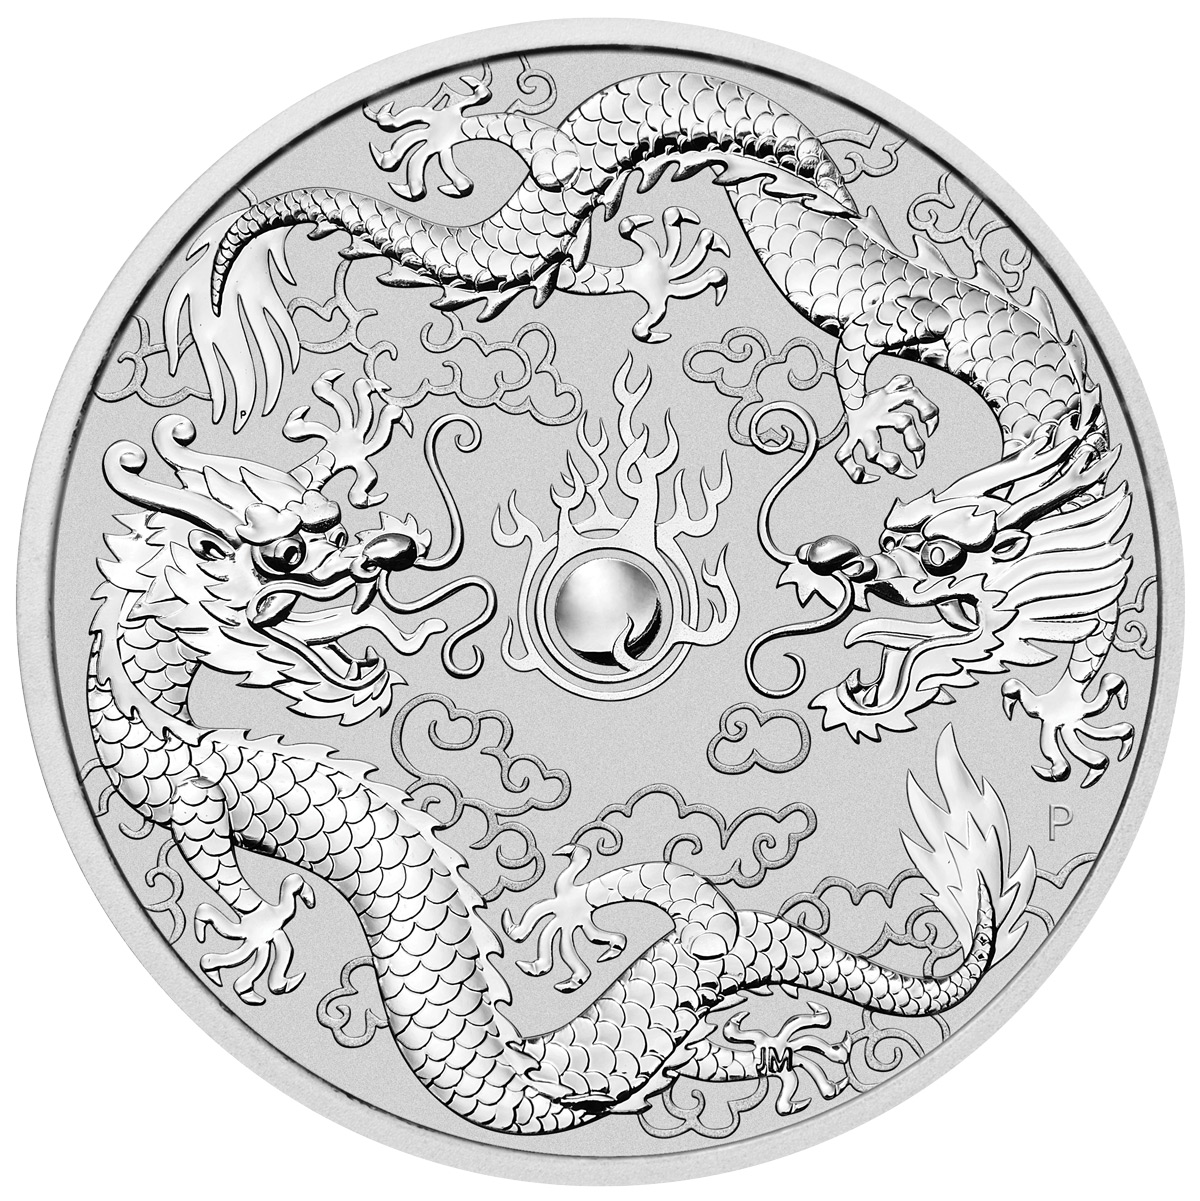 Silberm 252 Nze Double Dragon 2019 Doppel Drache 1oz Silber